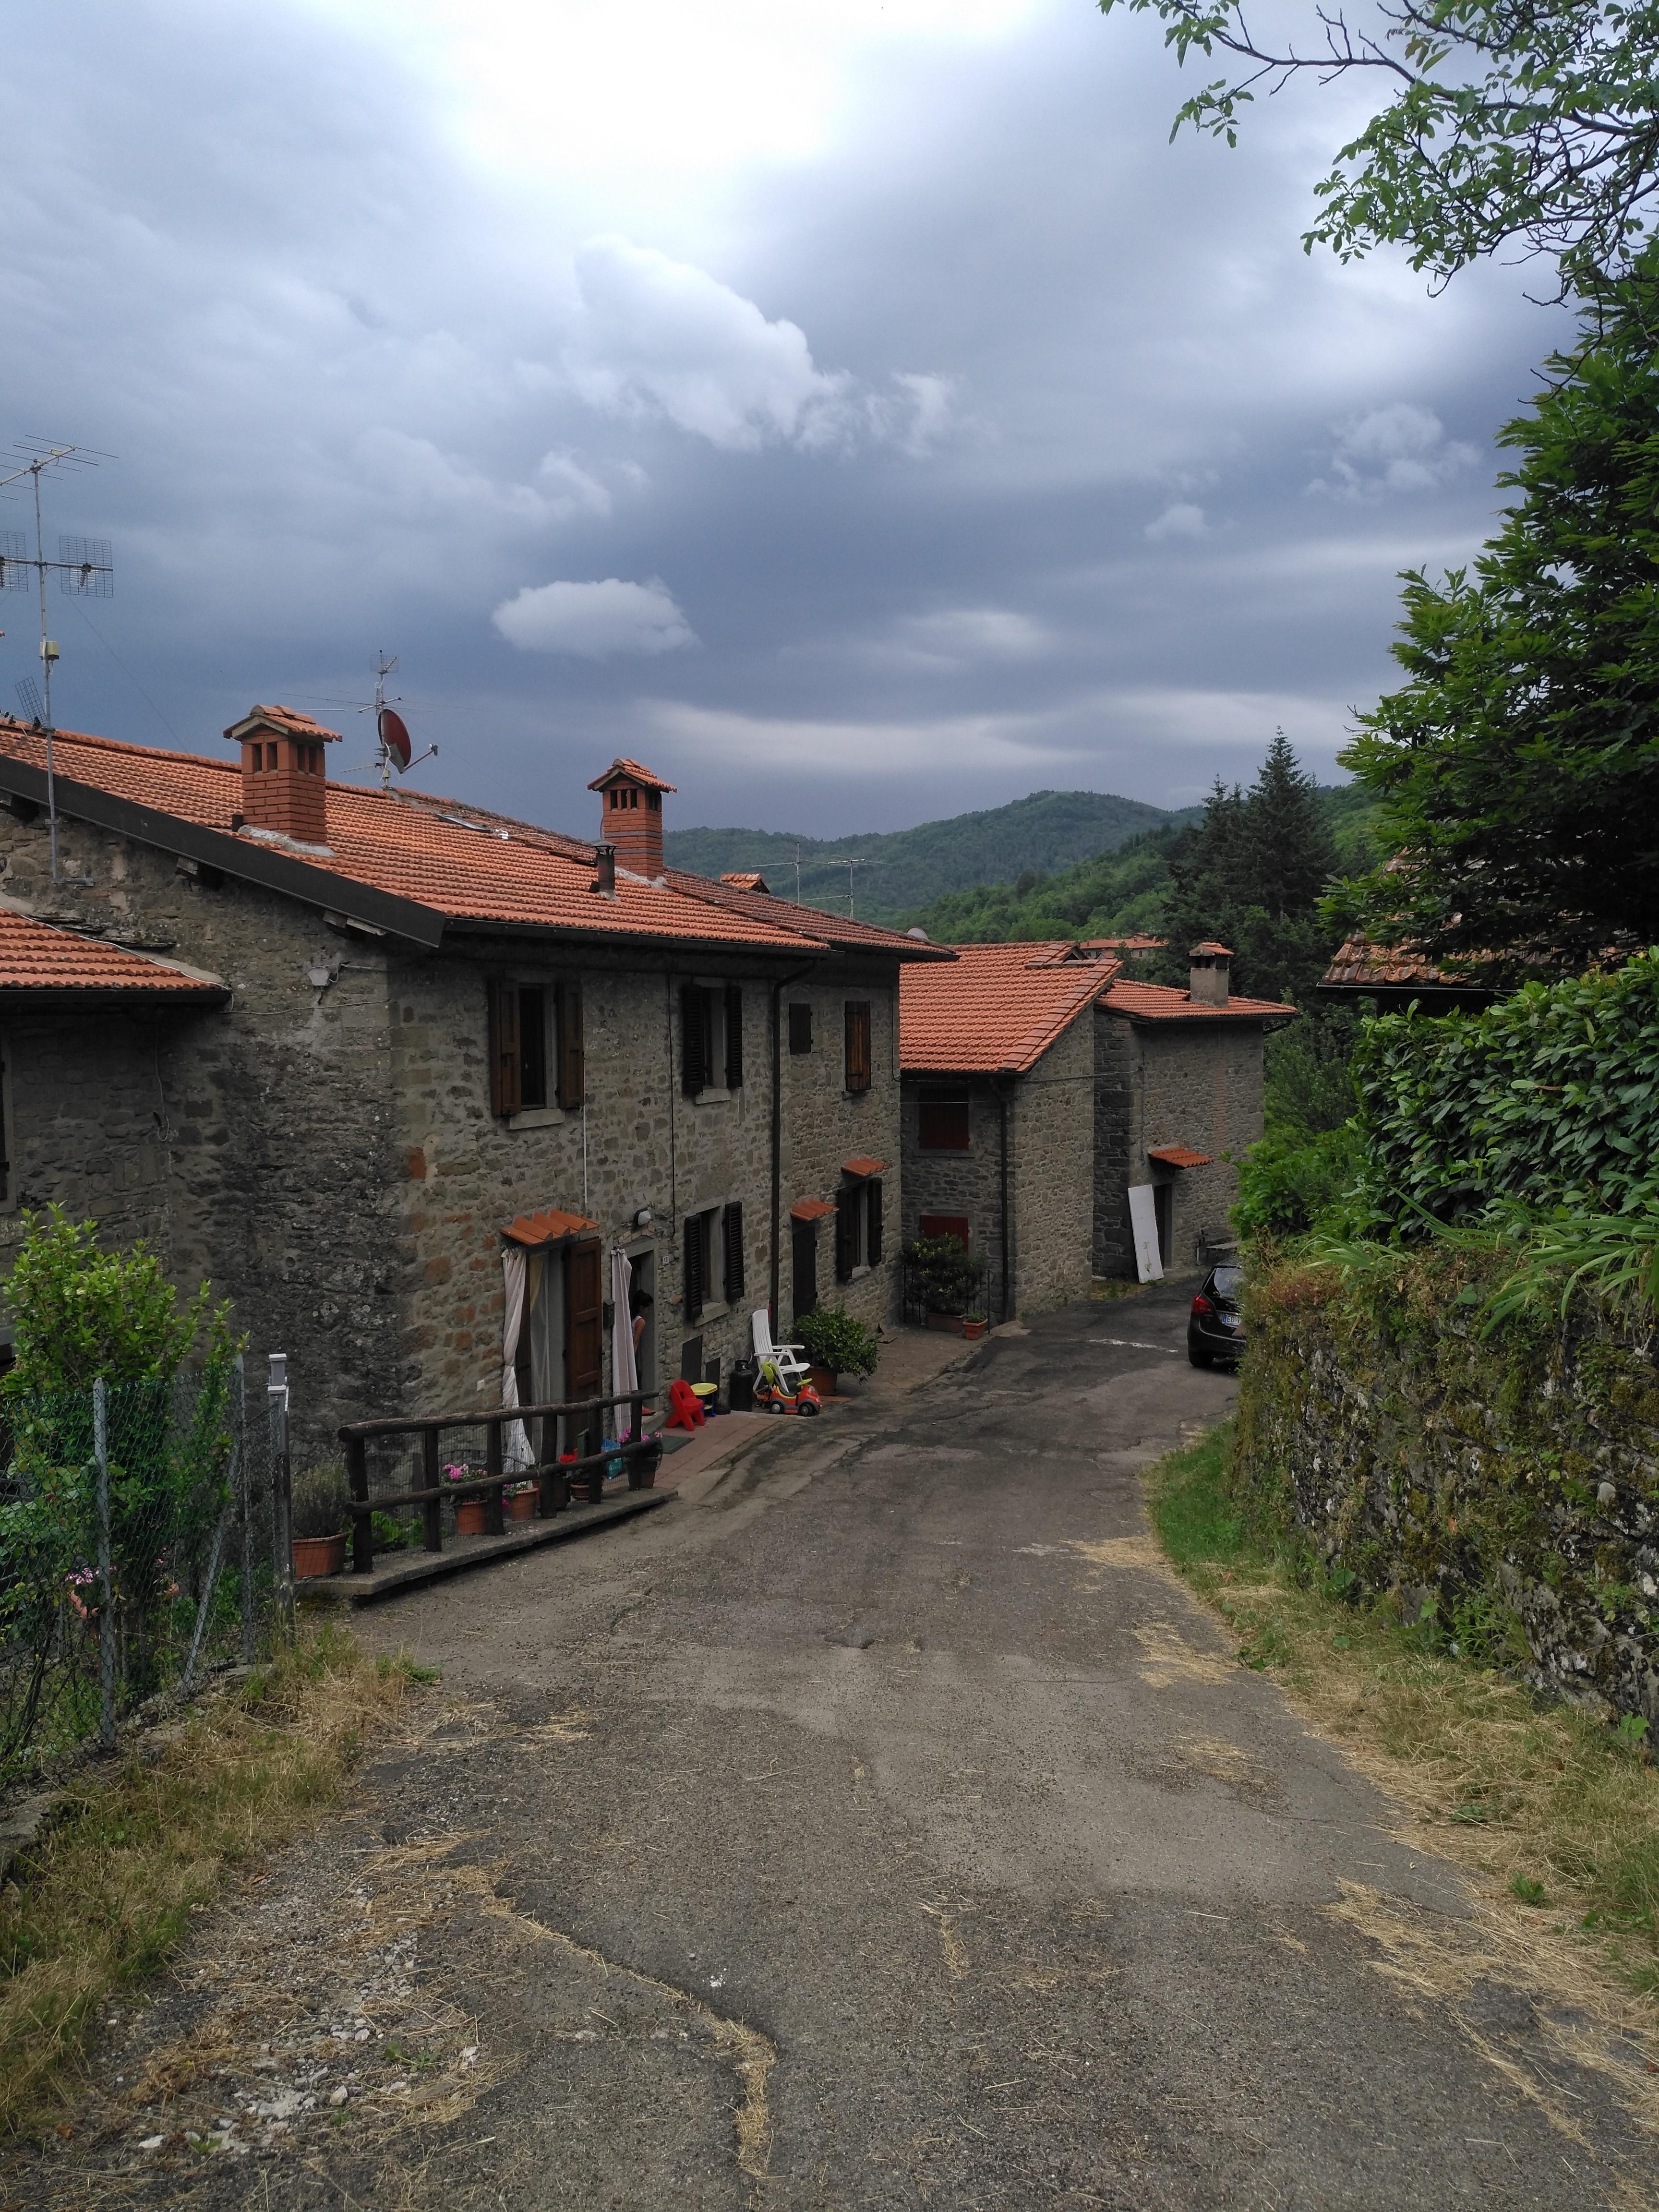 Via Ghibellina - Pieve a Pitiana - Prato di Strada